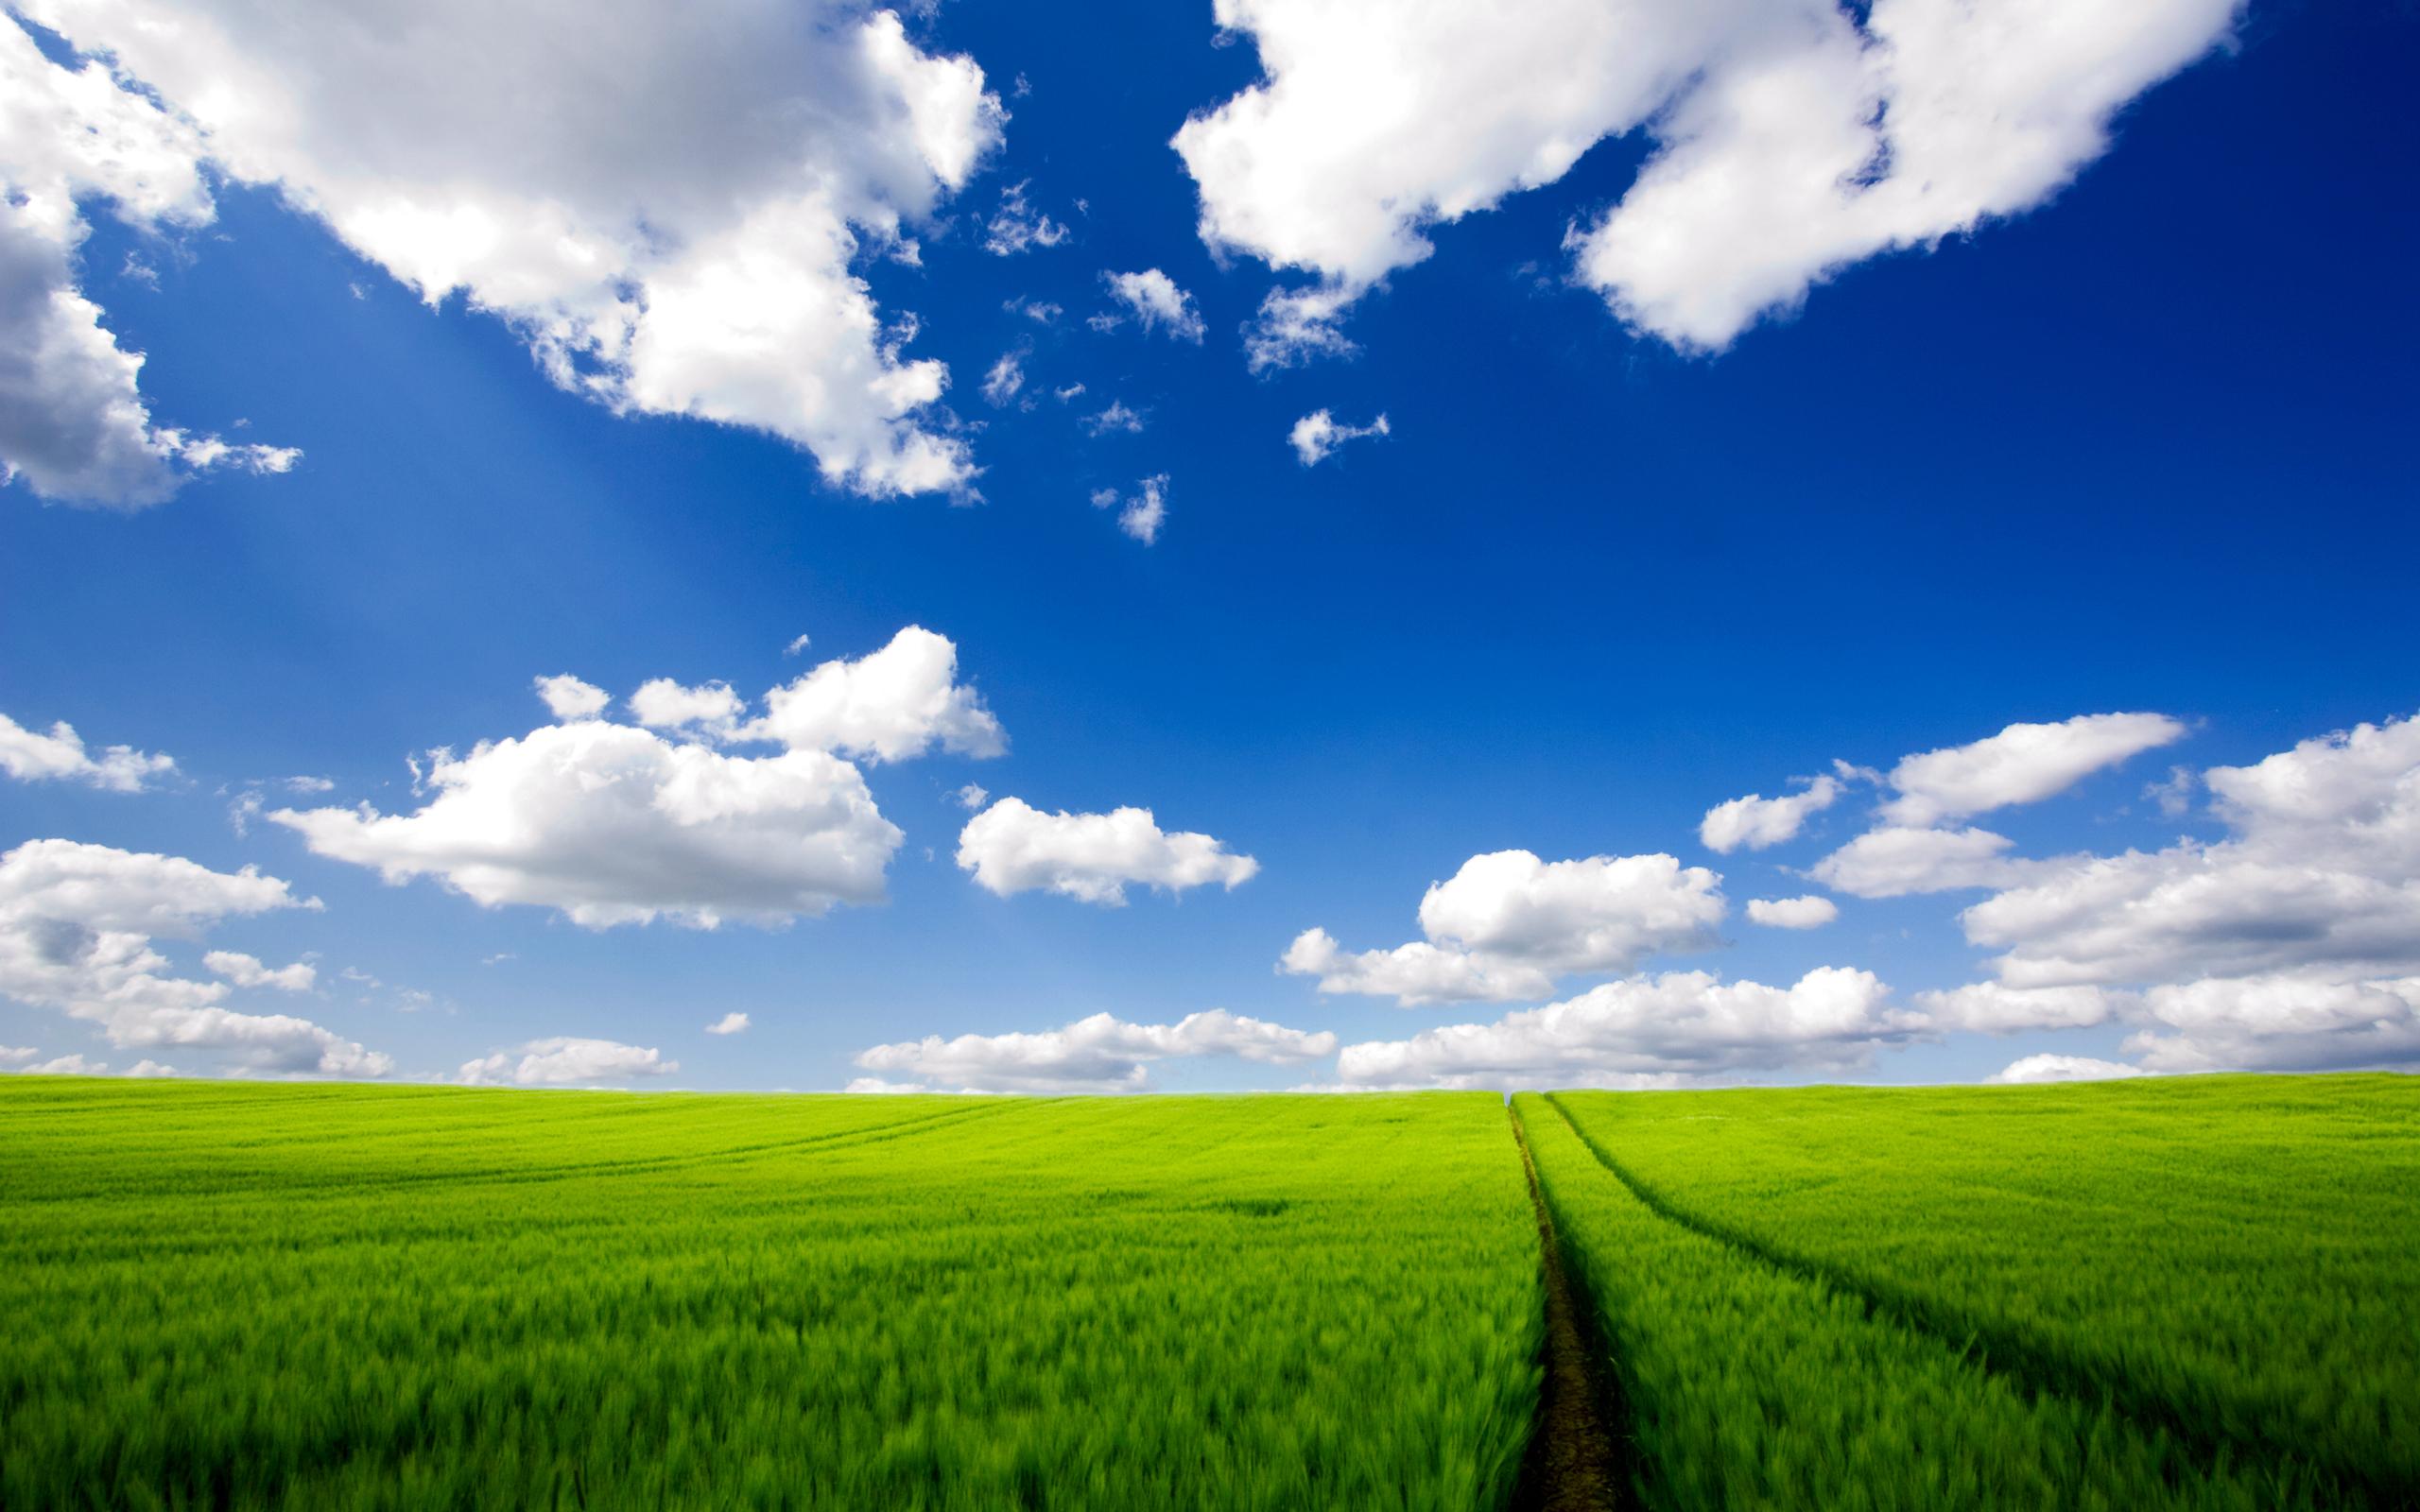 http://cdn.oboi7.com/8d74c29b8b5a0b2729d042384d8ae388c159b990/oblaka-pejzazhi-priroda-polya-luga-nebo.jpg